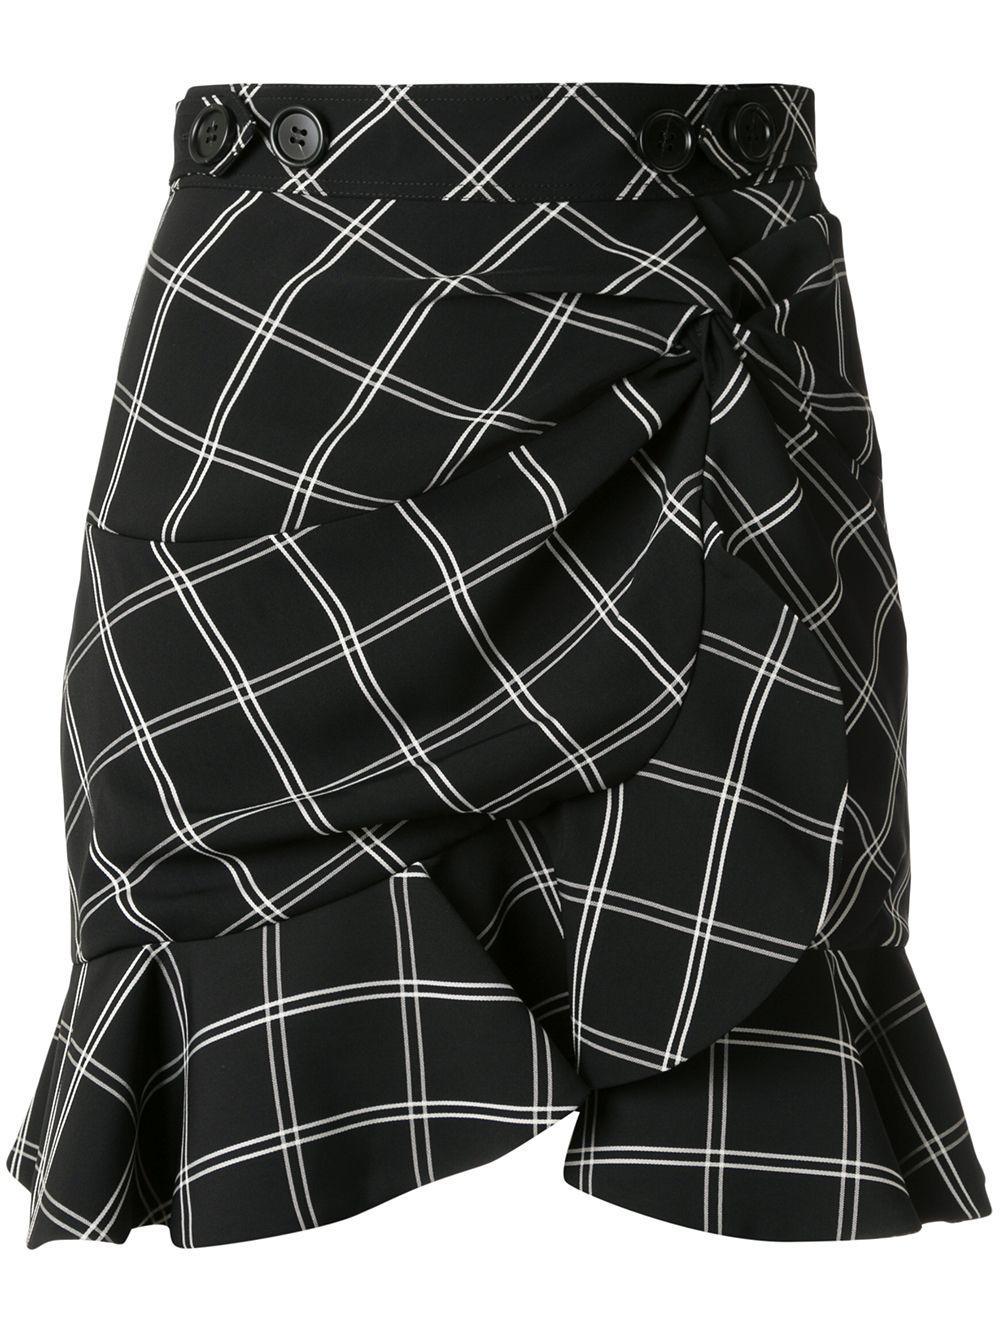 Self-Portrait asymmetric gathered skirt